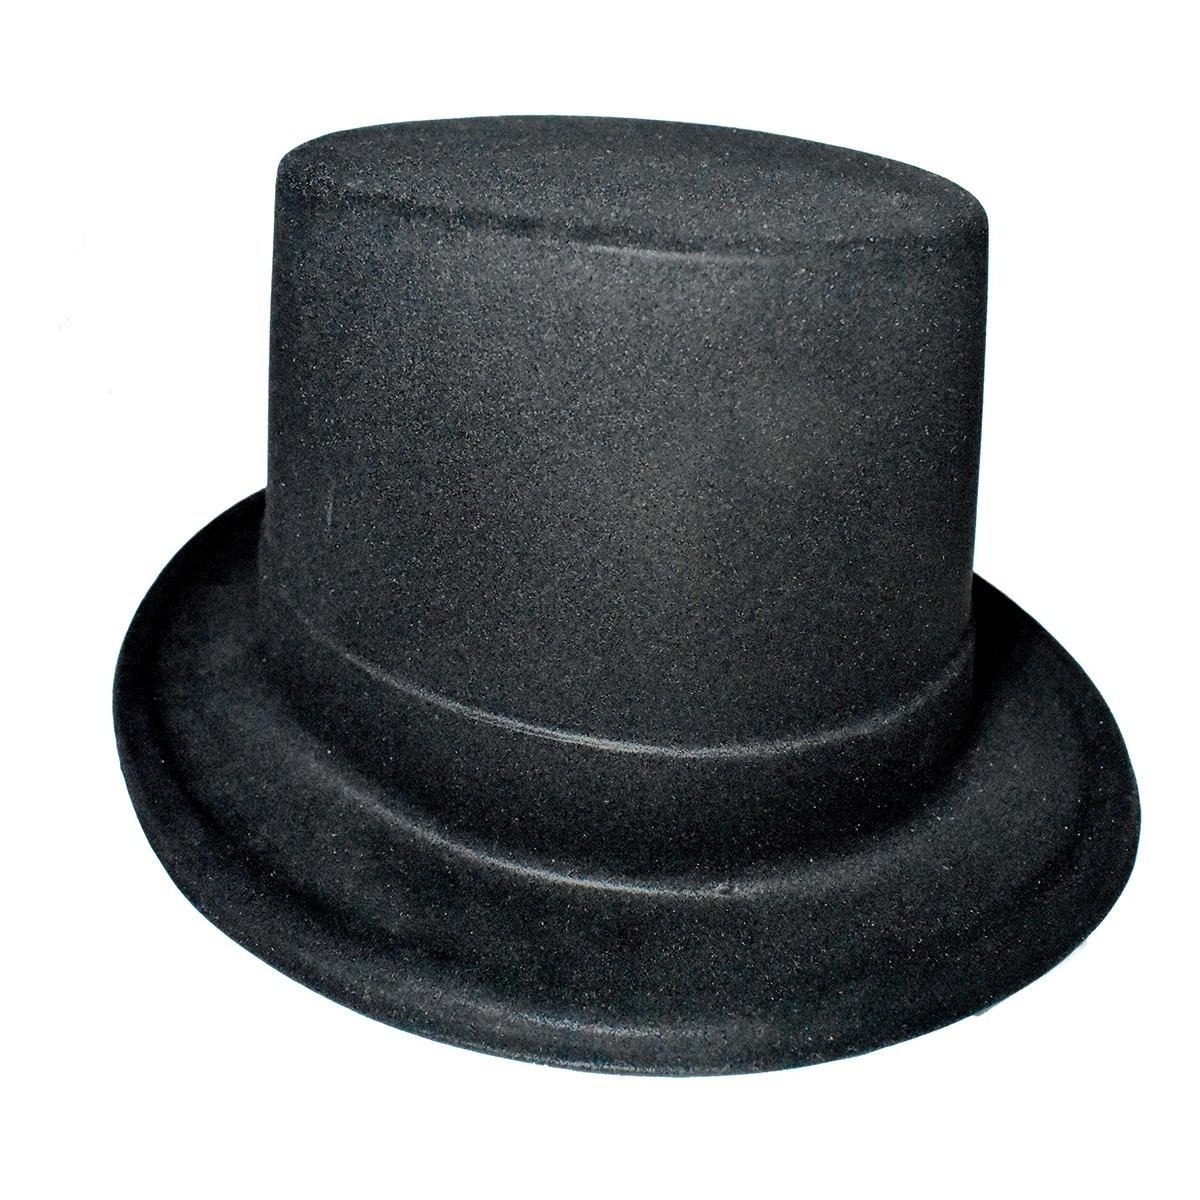 3e8086697b7c4 30 sombreros copa negros para fiestas eventos tipo mago. Cargando zoom.